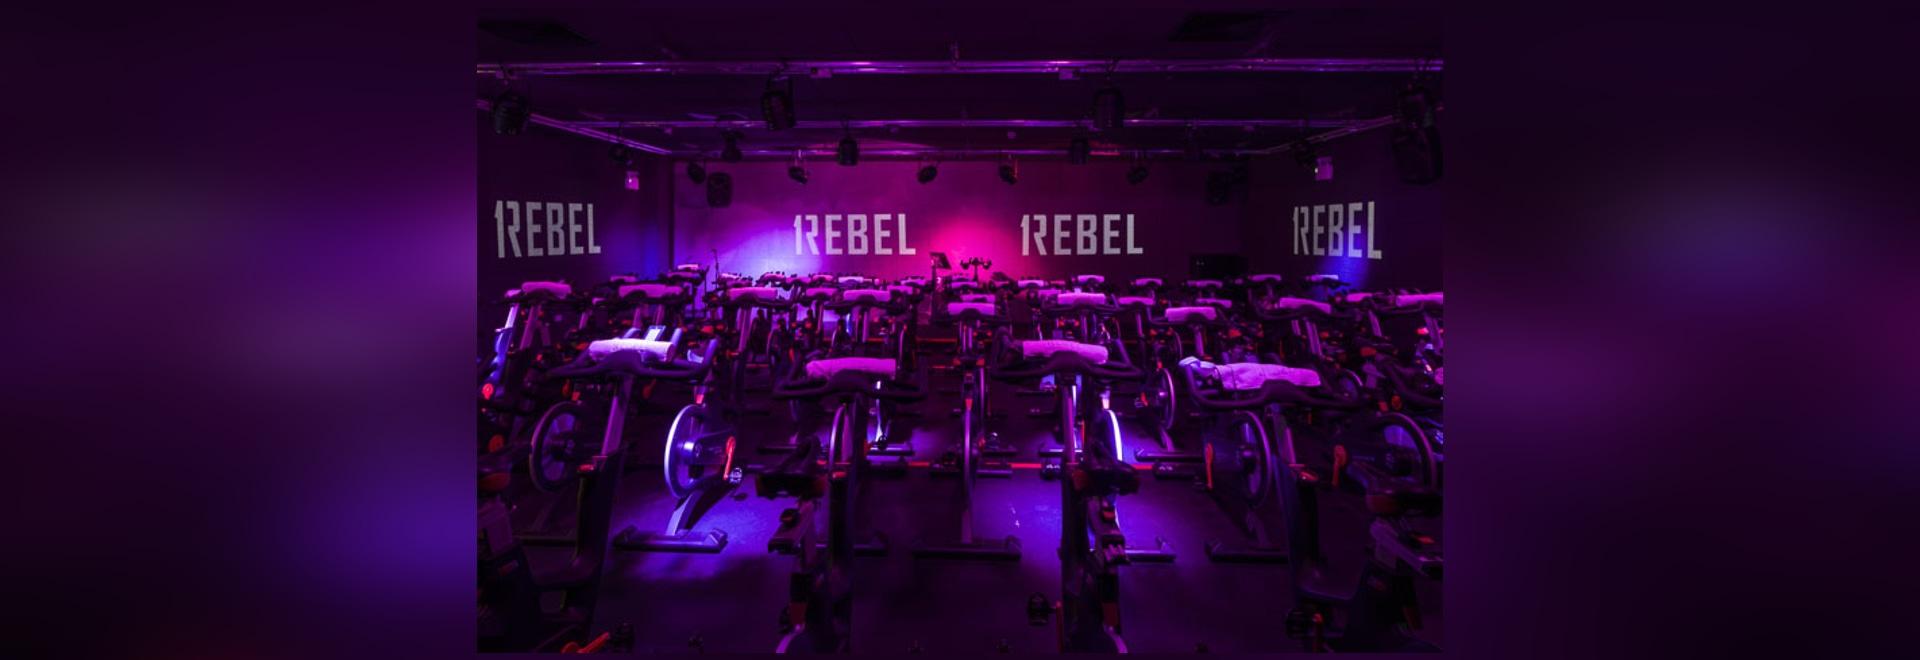 gimnasia del boutique 1Rebel en Londres de Studio C102